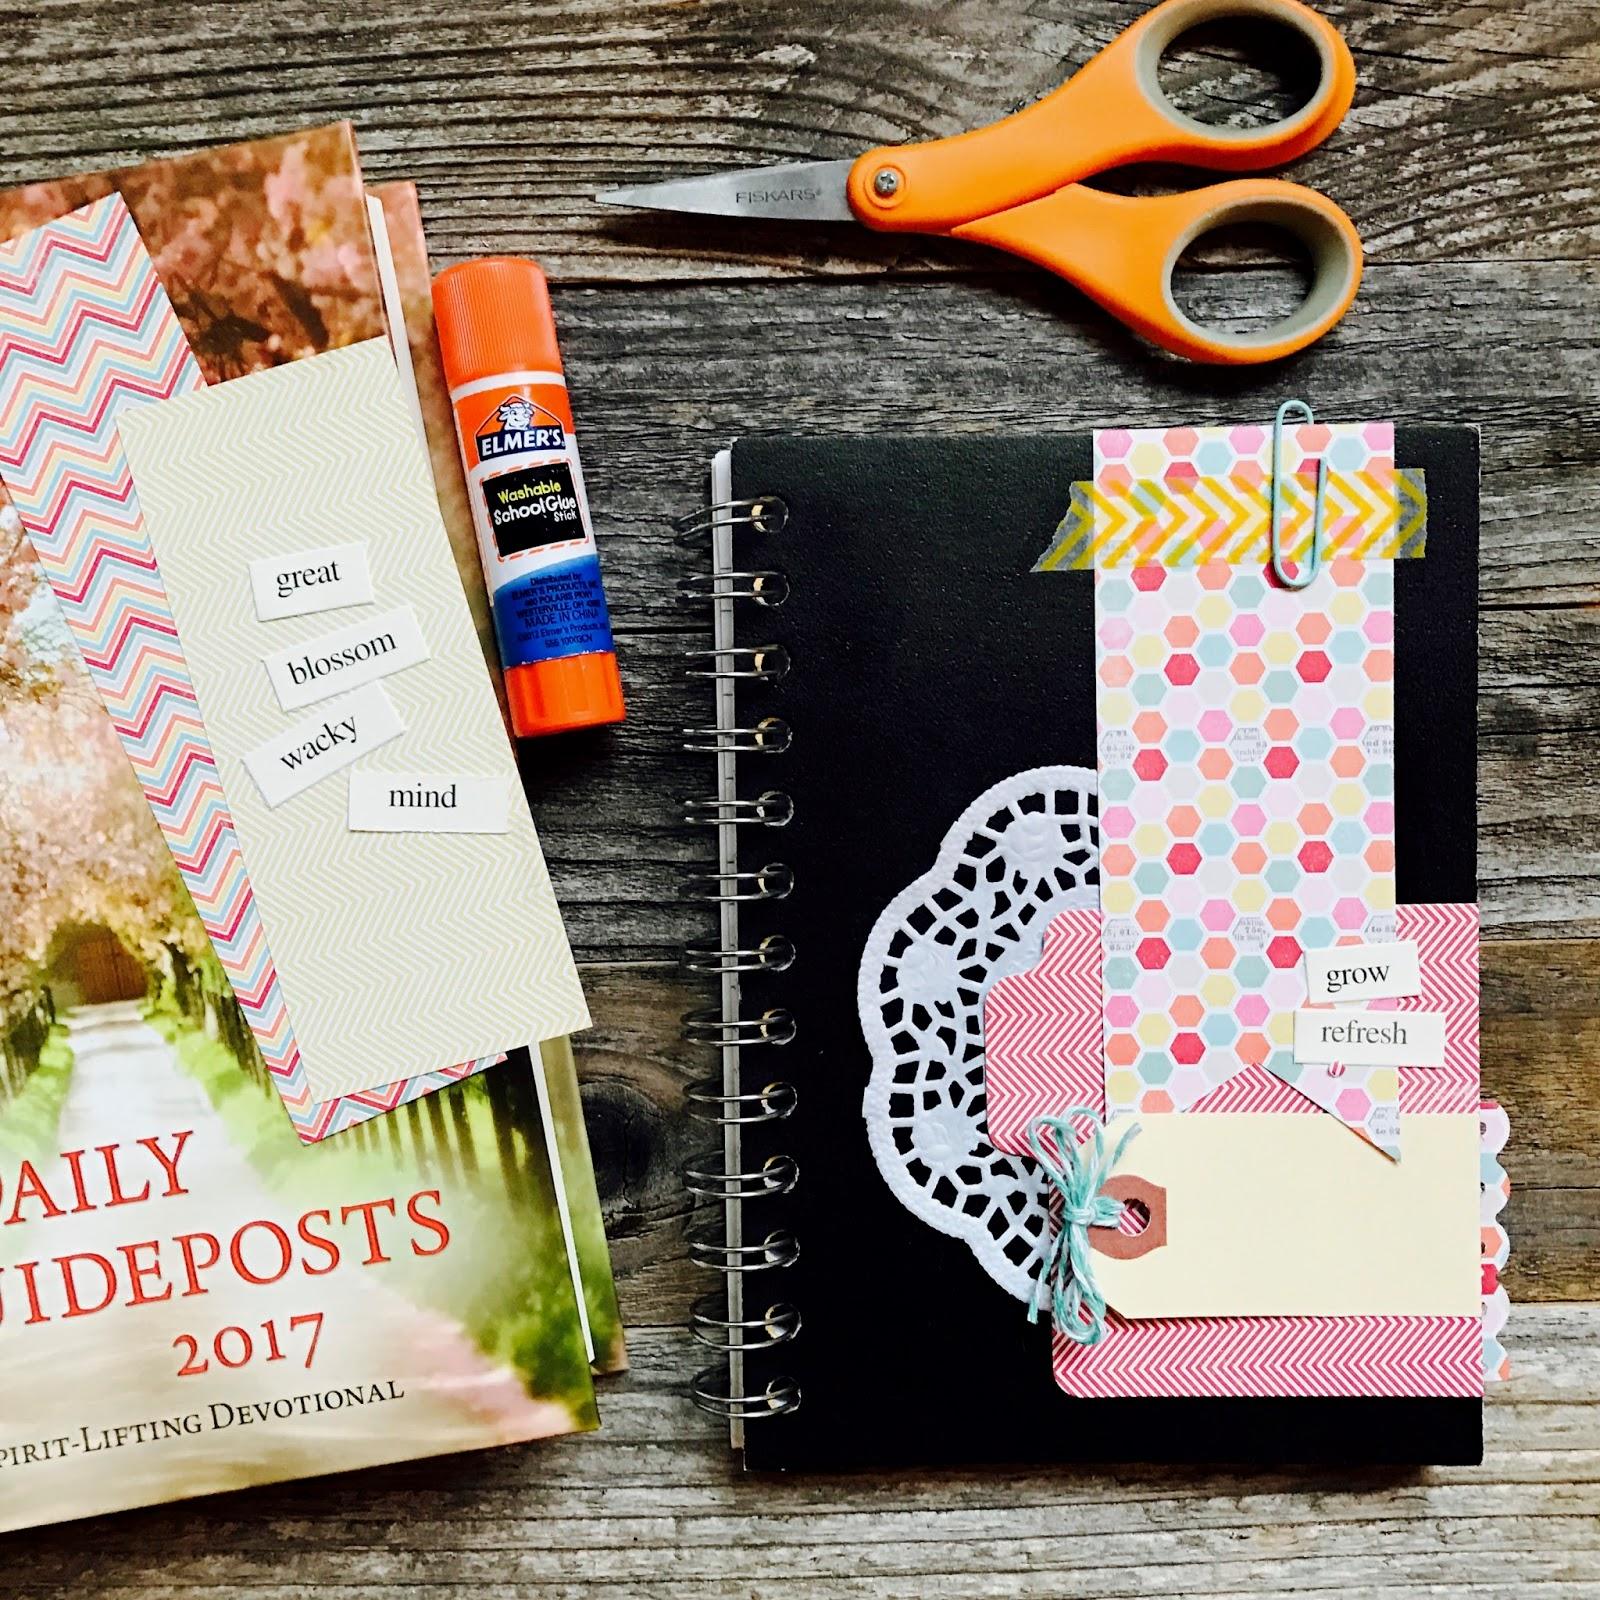 #journal #mini album #lists #notebook #devotional #iloveitall #papercraft